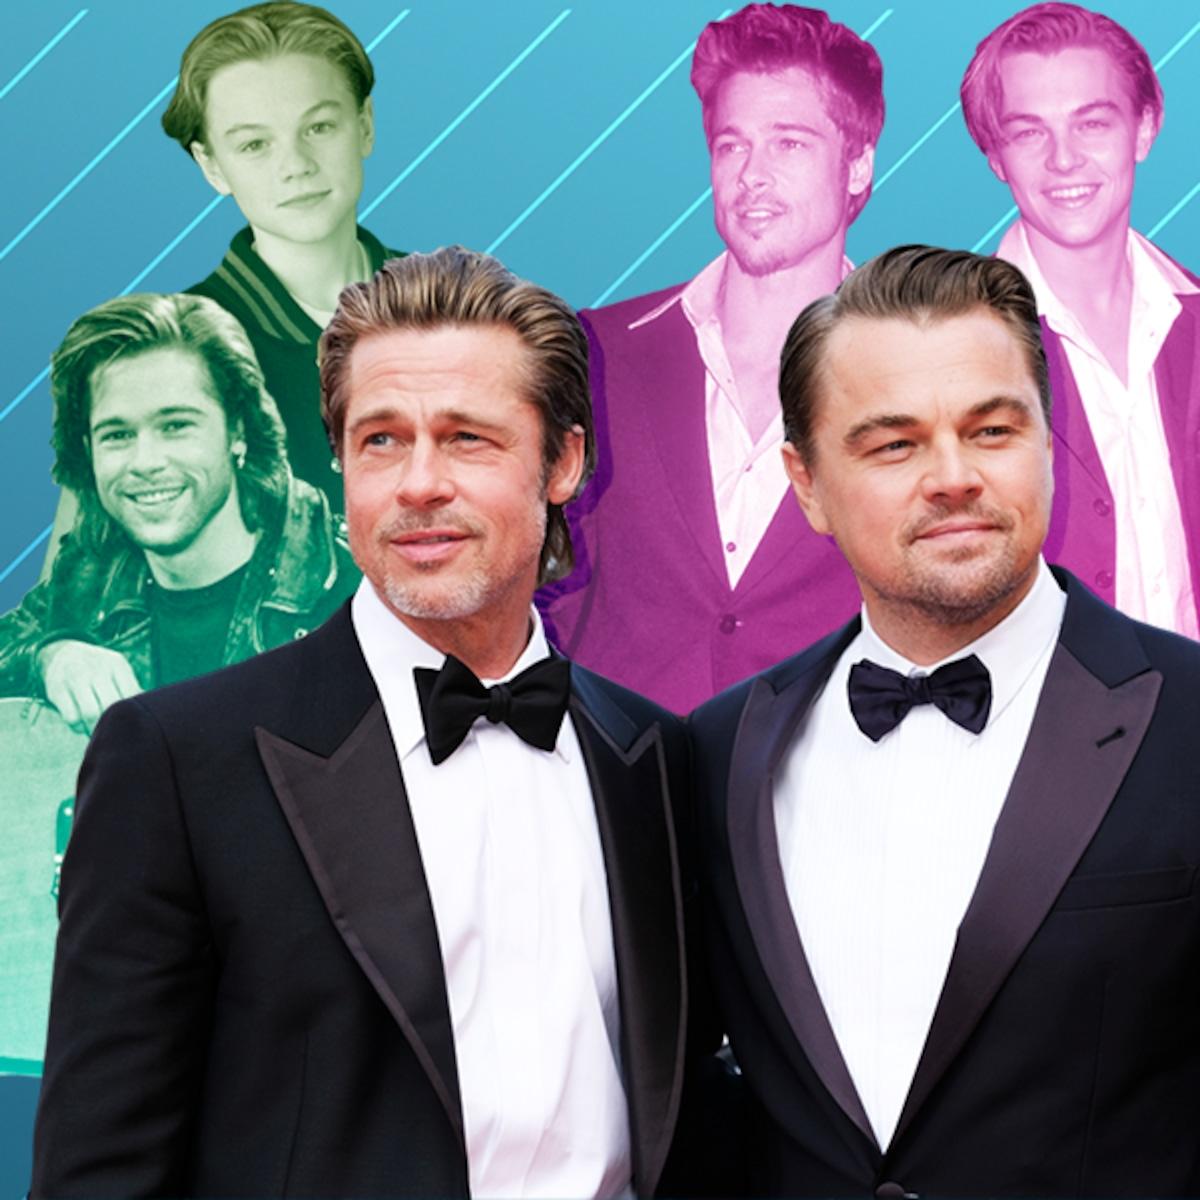 Leonardo Dicaprio Young : Look Back At Young Leonardo ...